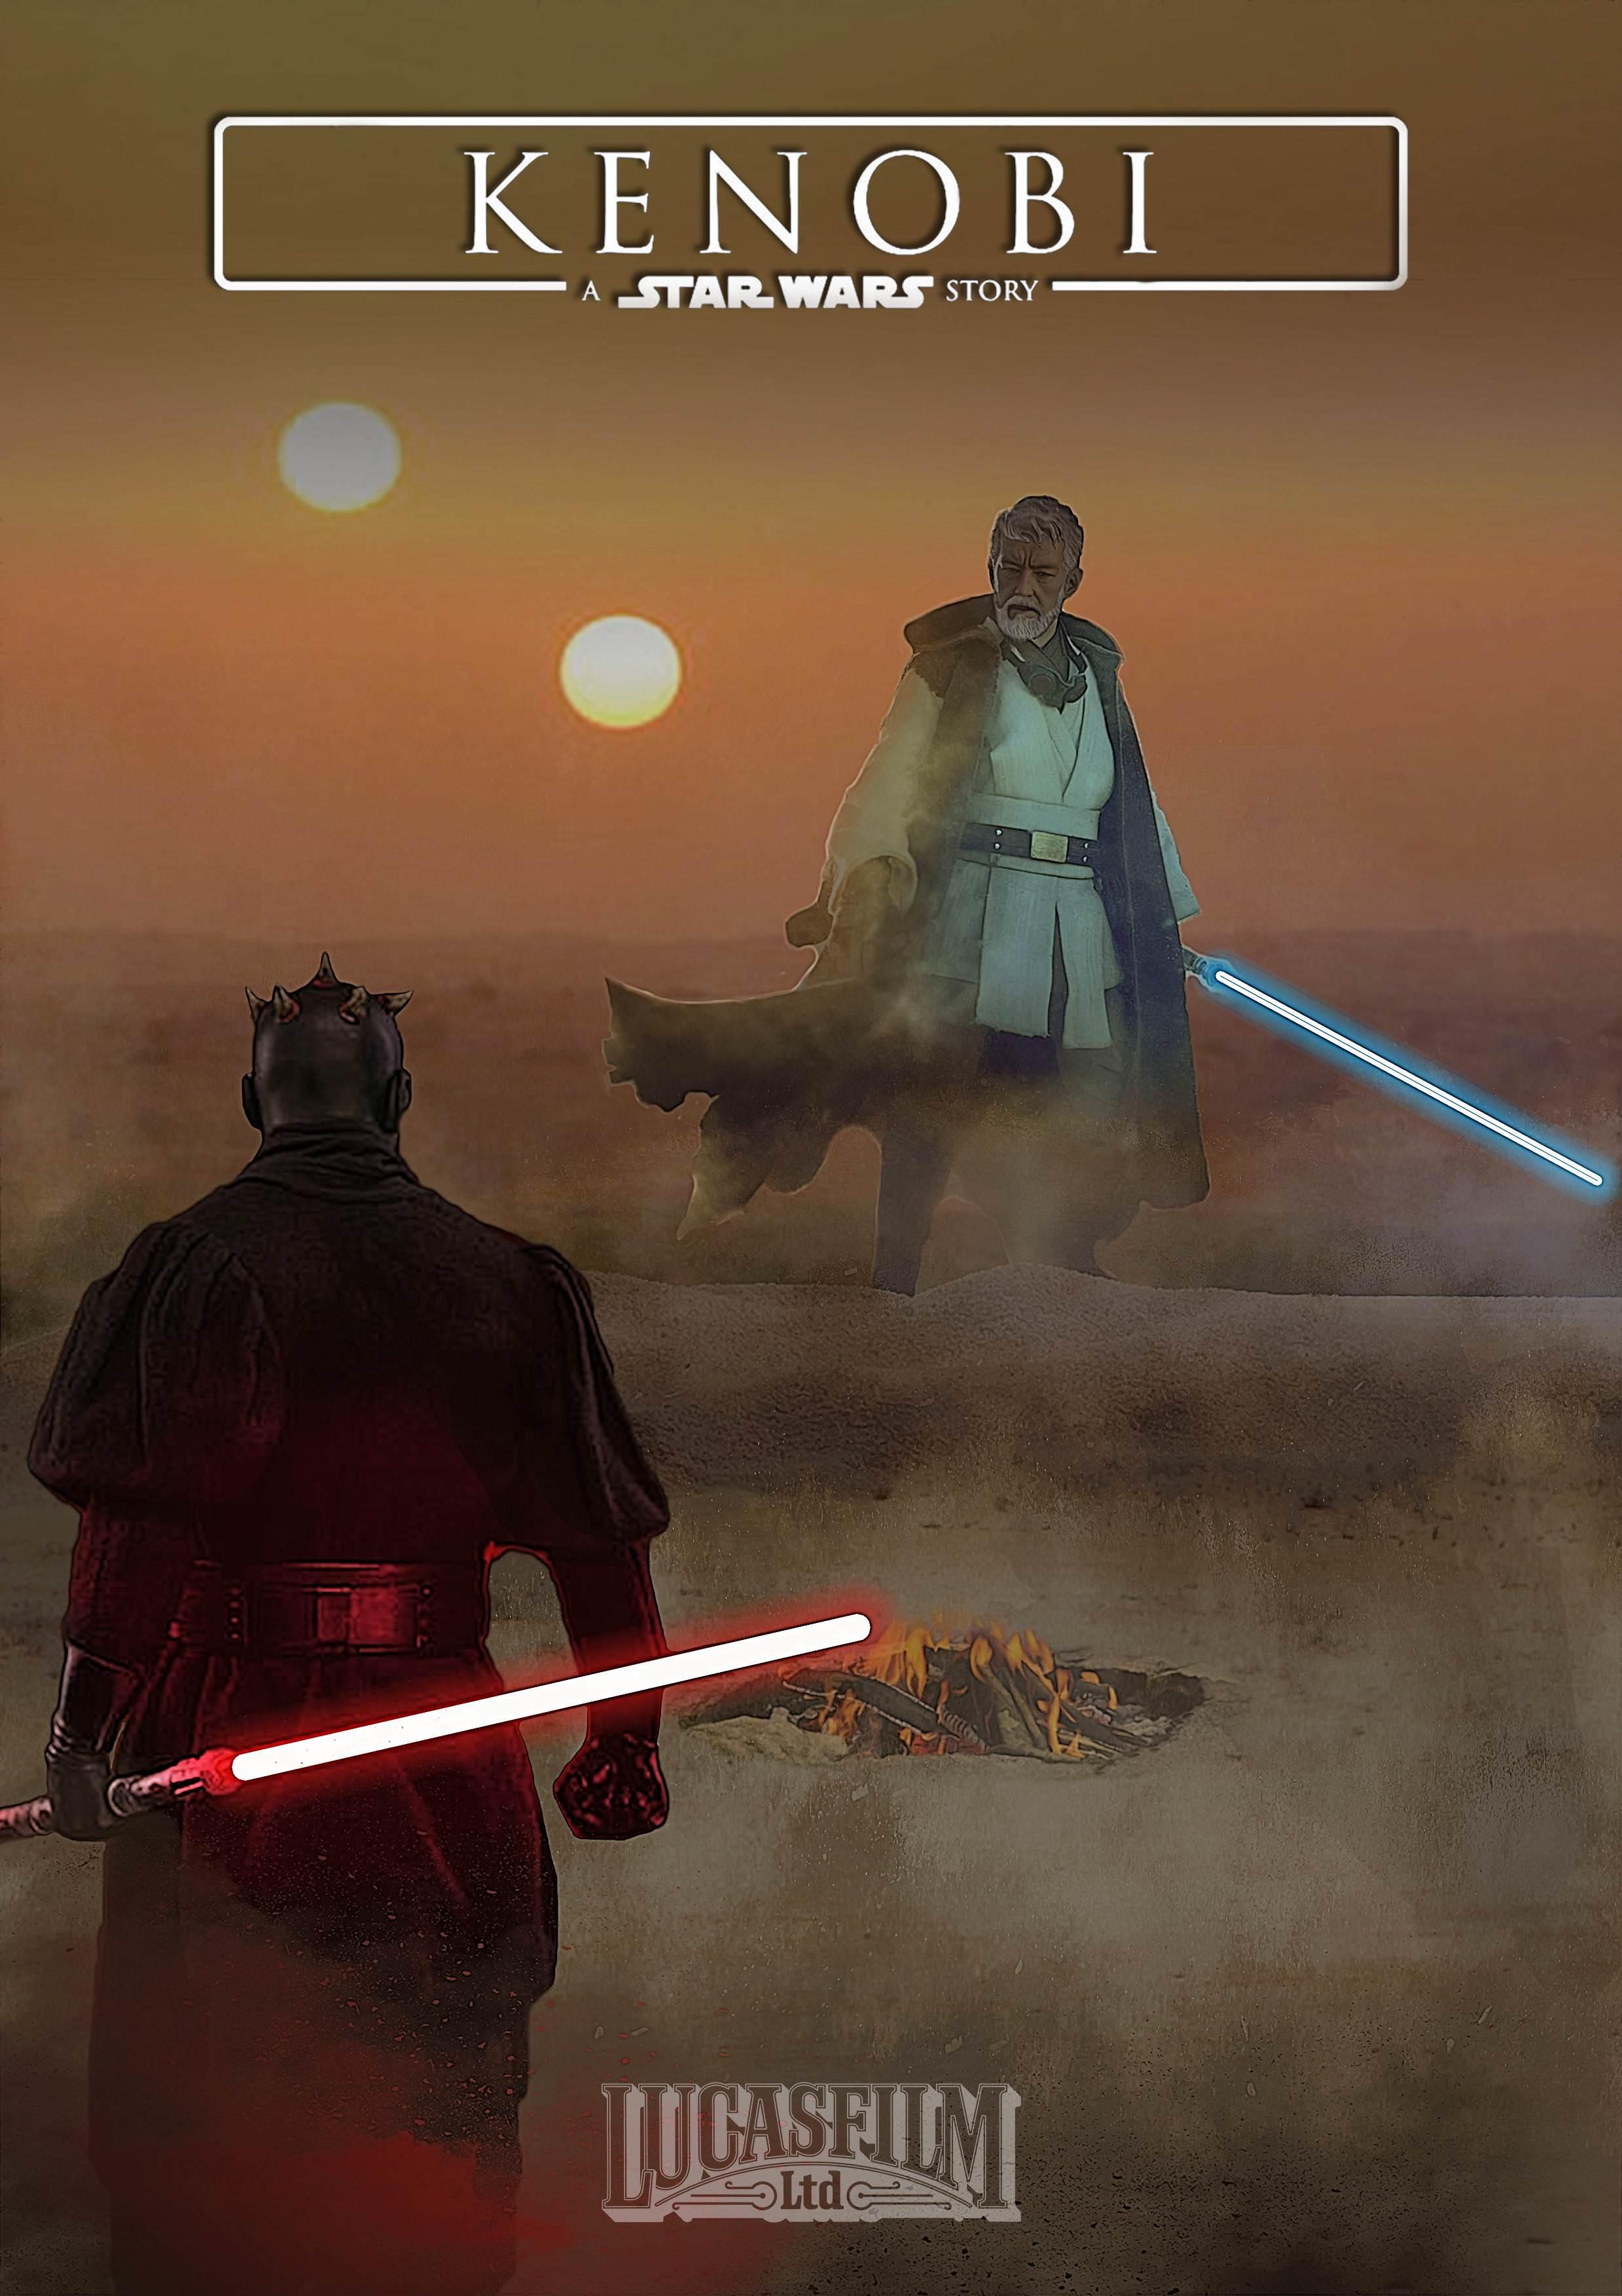 (Fanart) Sixth Scale figures \'Kenobi\' poster